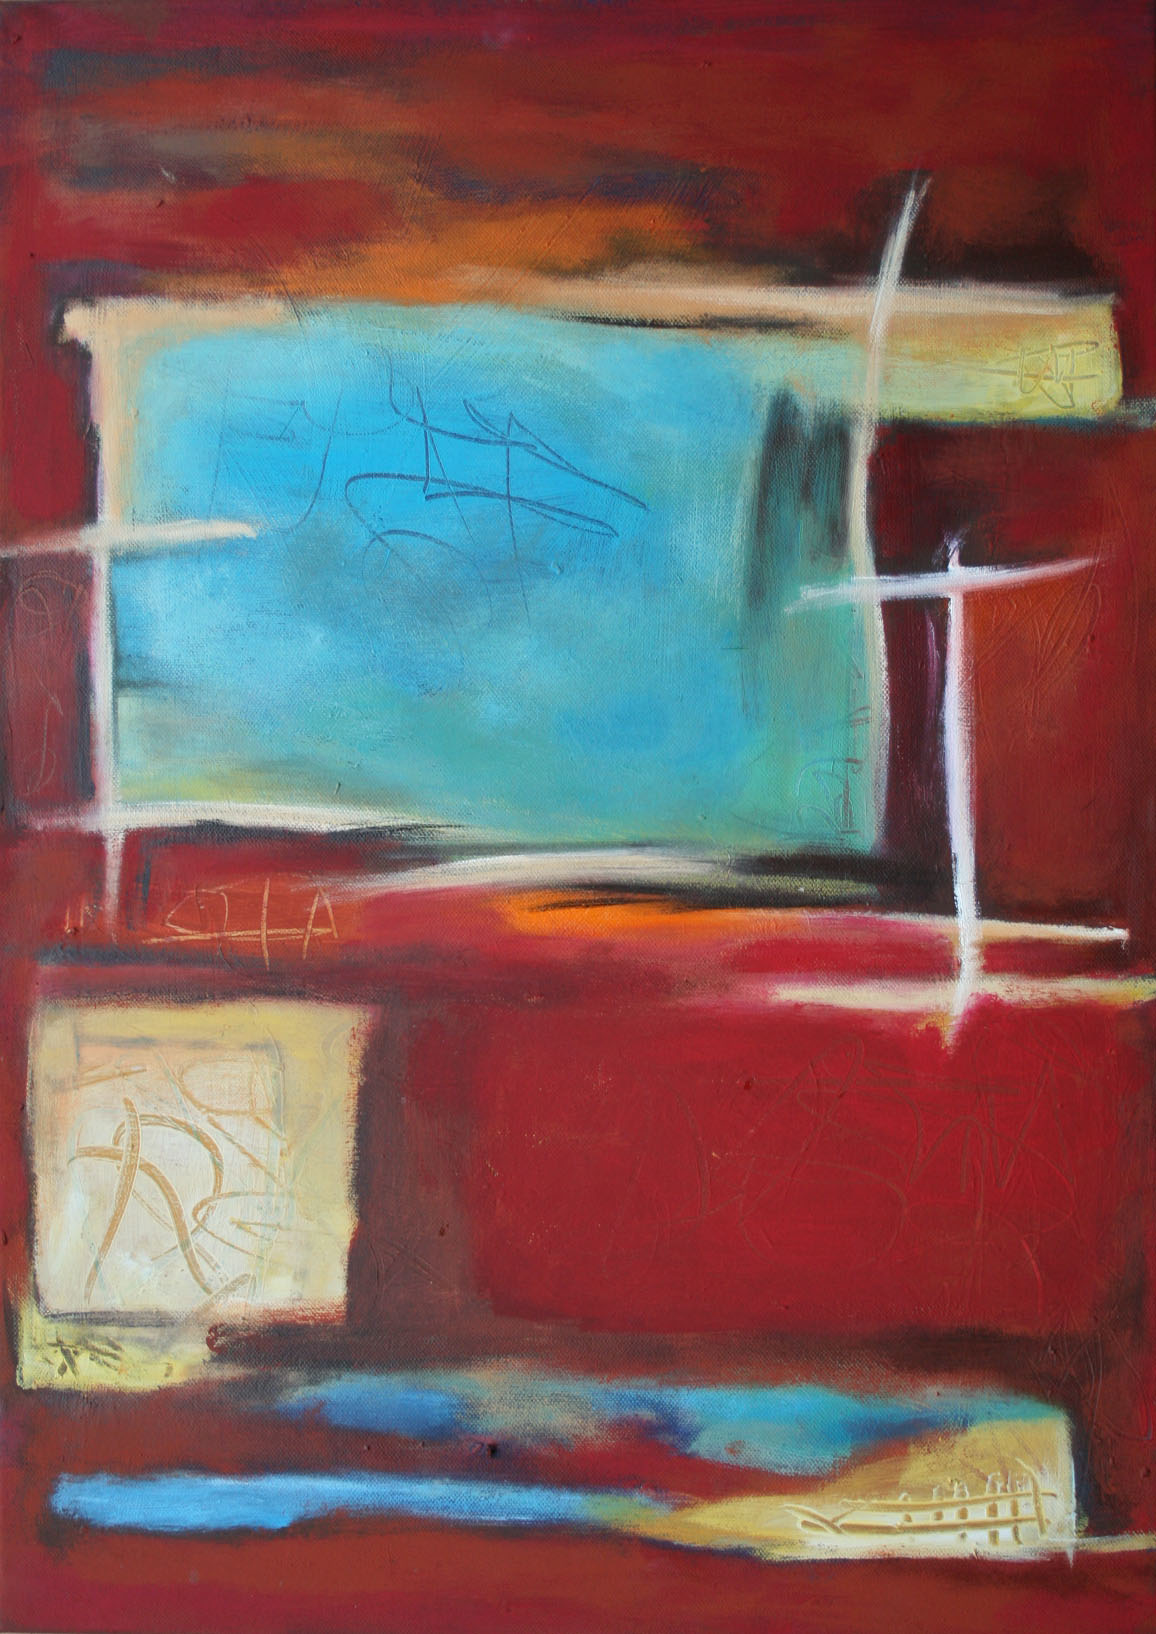 Tief im Rot II,  Öl und Acryl auf Leinwand, 70 x 50 cm